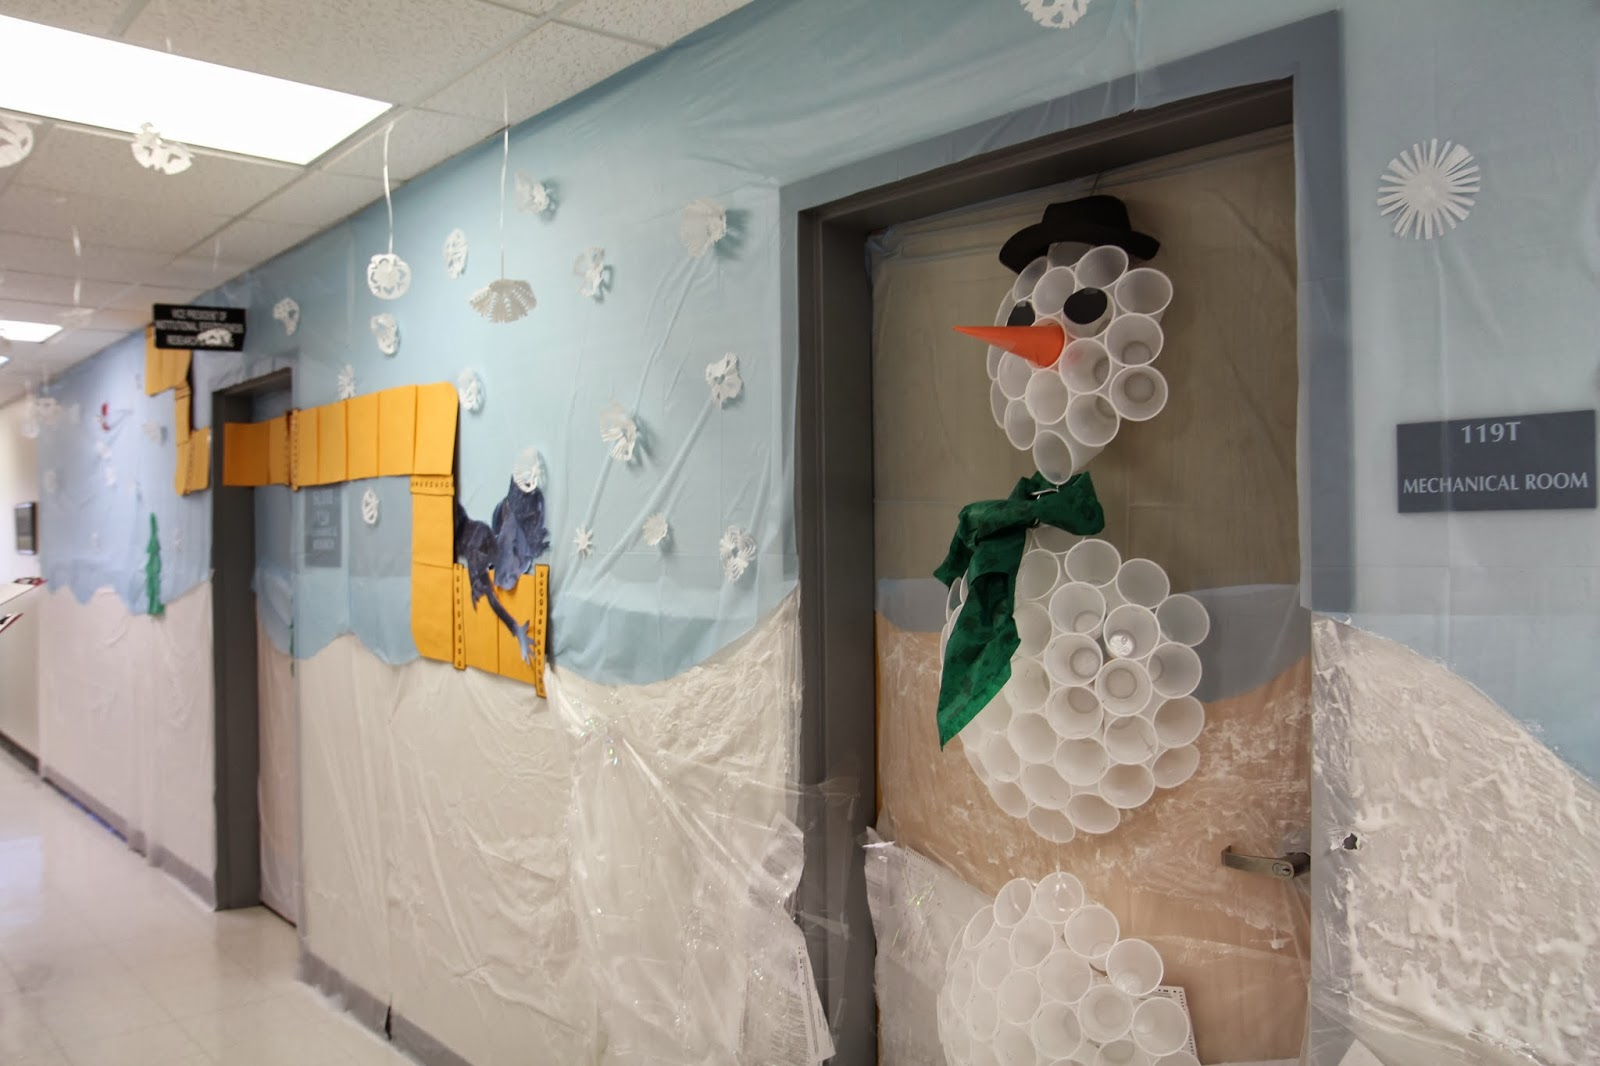 Office Door Decorating Contest Ideas Photos | yvotube.com